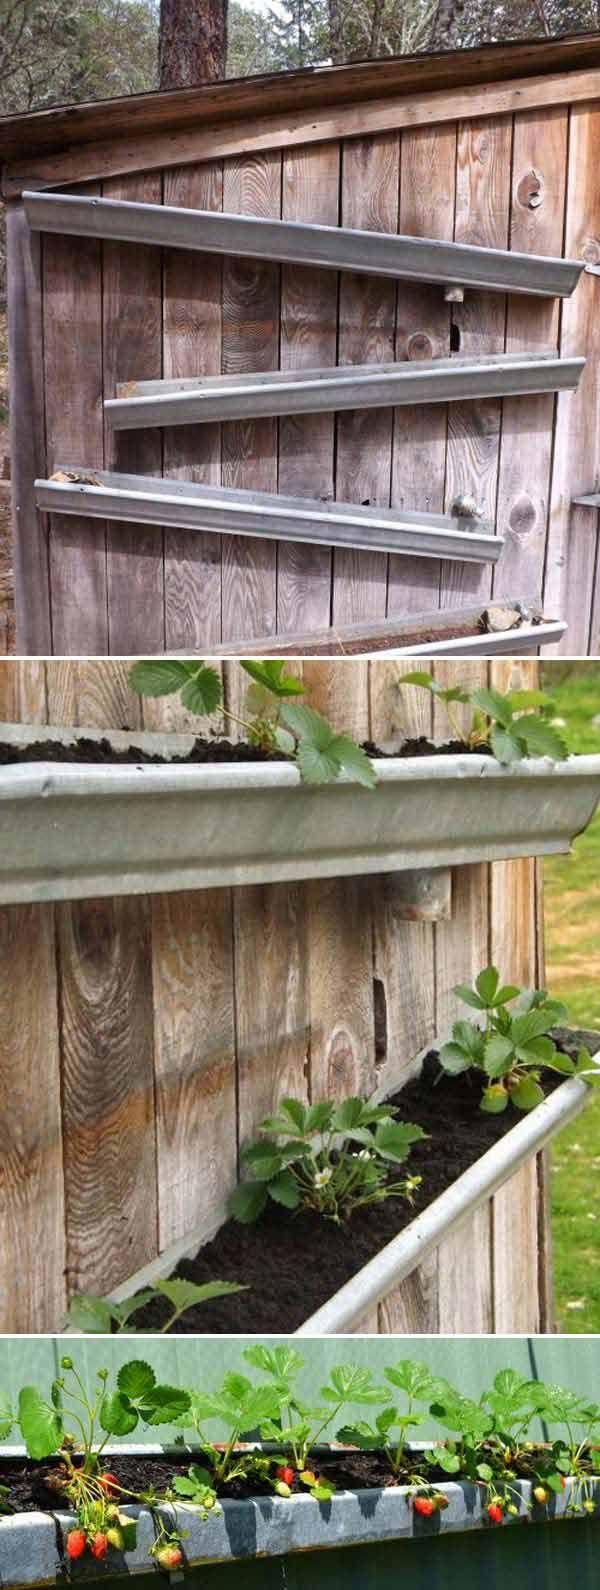 Diy vertical container strawberry planters rain gutters strawberry garden